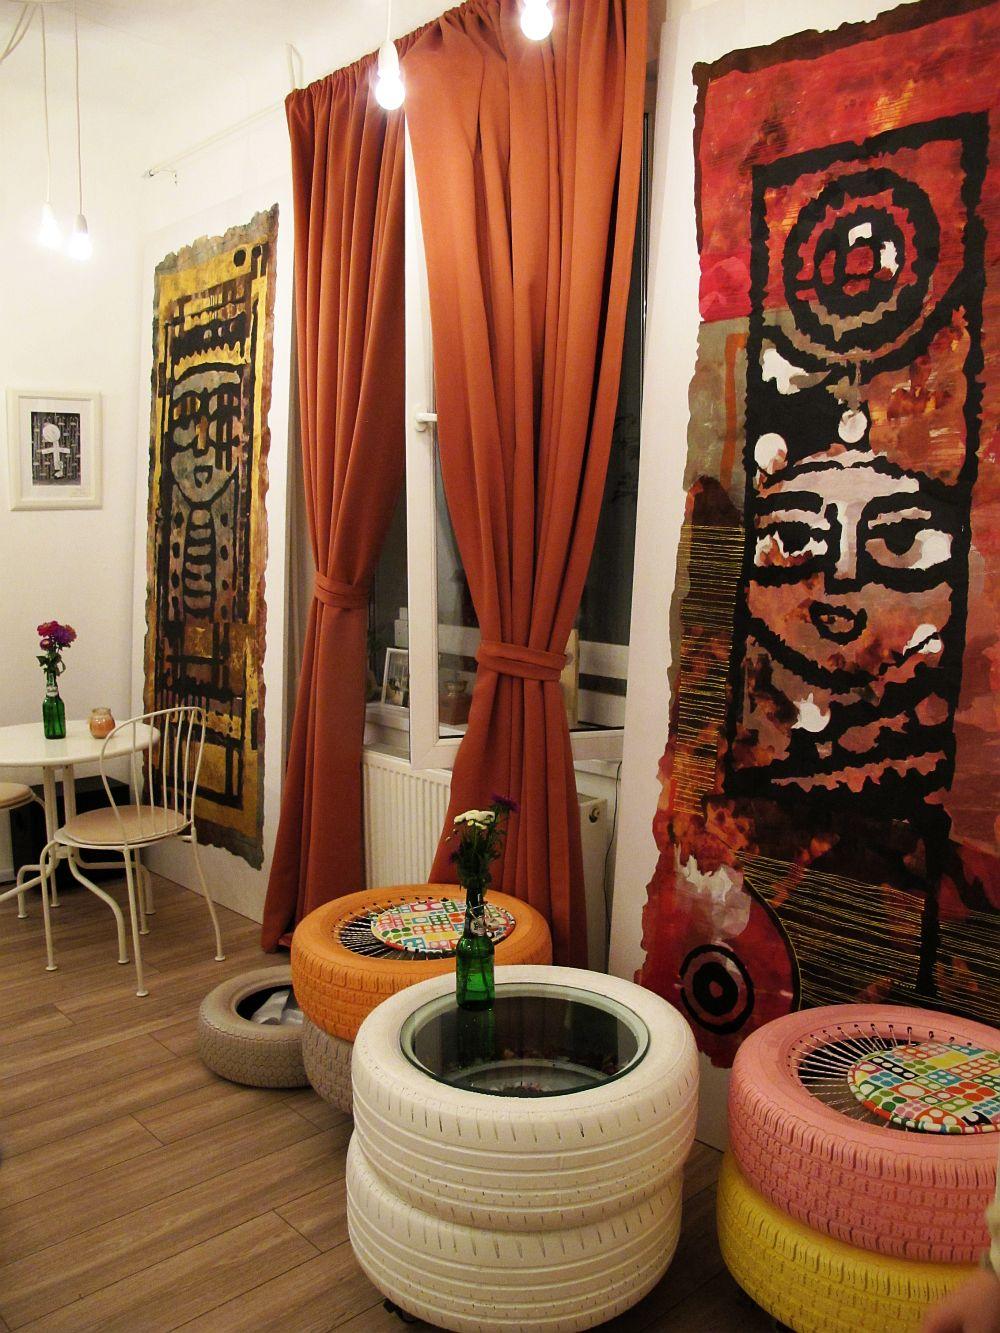 adelaparvu.com despre O povEstetica, expozitie la Pallets, artisti Alina Borcea si Anca Buzilan (3)